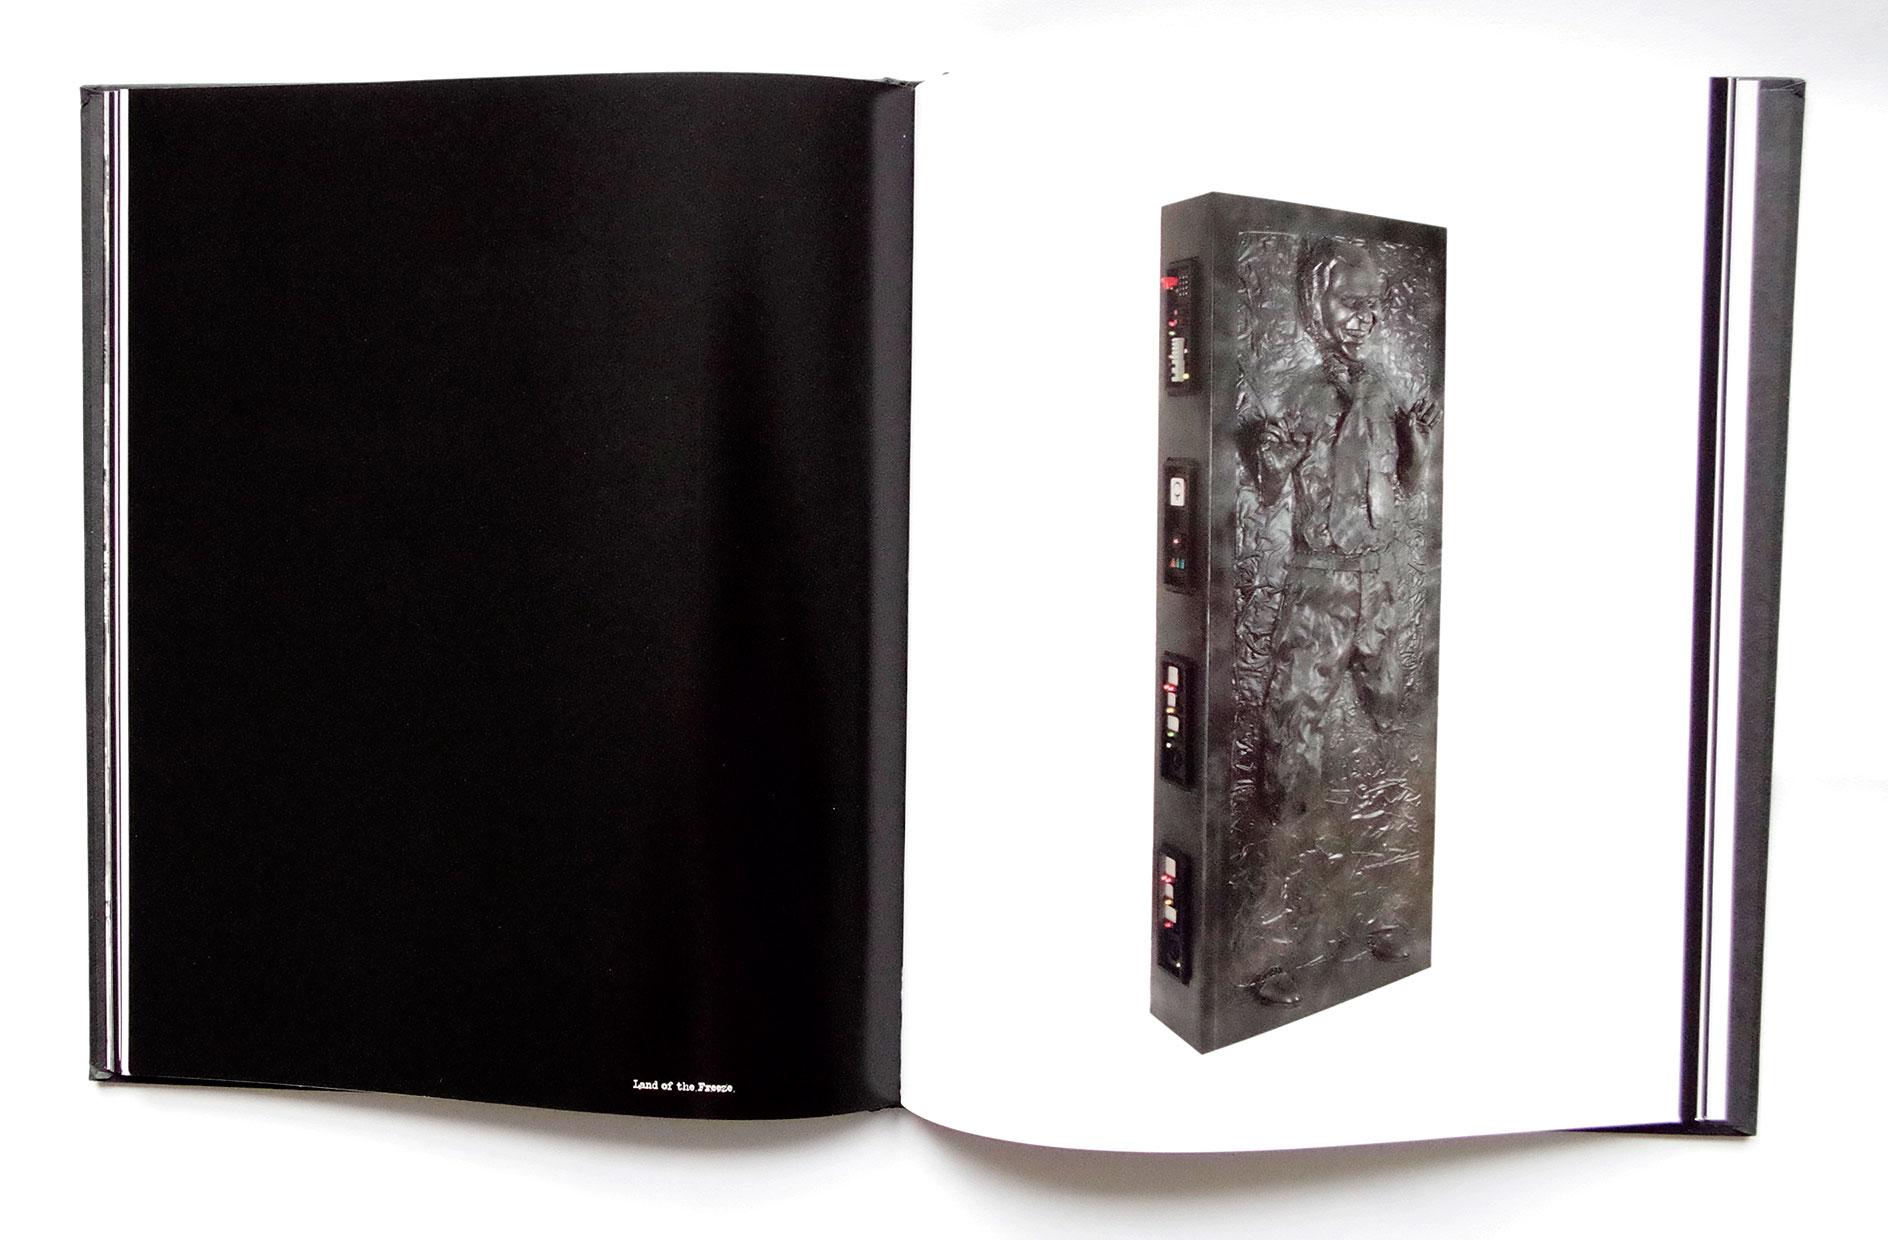 epm-print-management-bristol-art-books-ben-turnbull-4.jpg